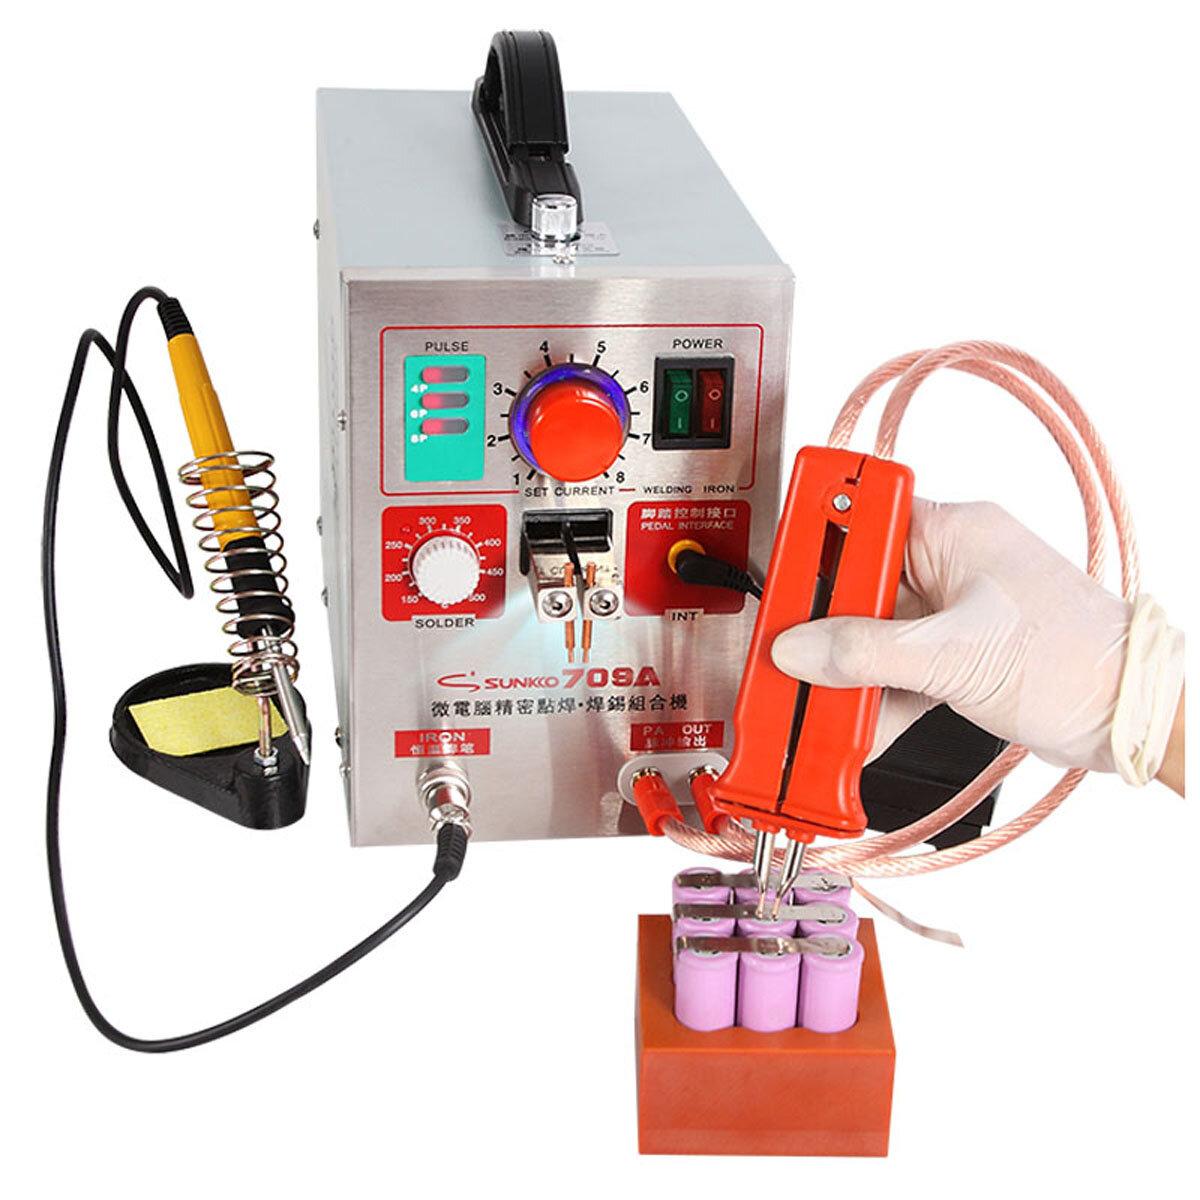 hight resolution of sunkko 709a 1 9kw spot weld er soldering station welding machine universal welding pen